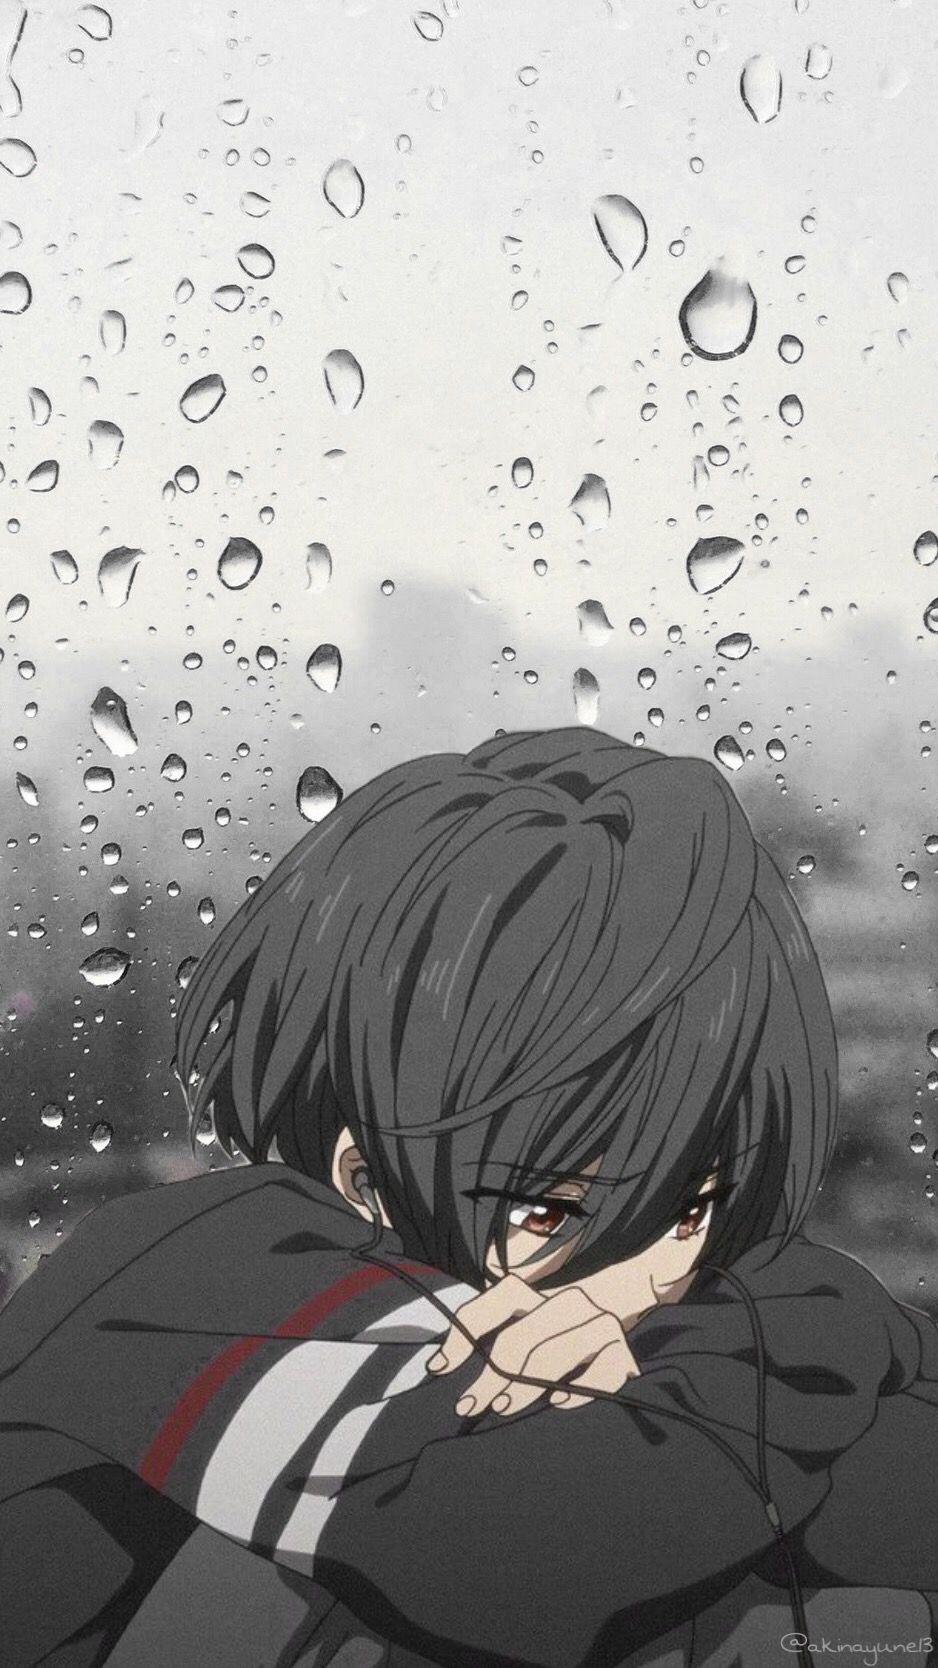 Sad Anime Wallpaper Phone : anime, wallpaper, phone, Depression